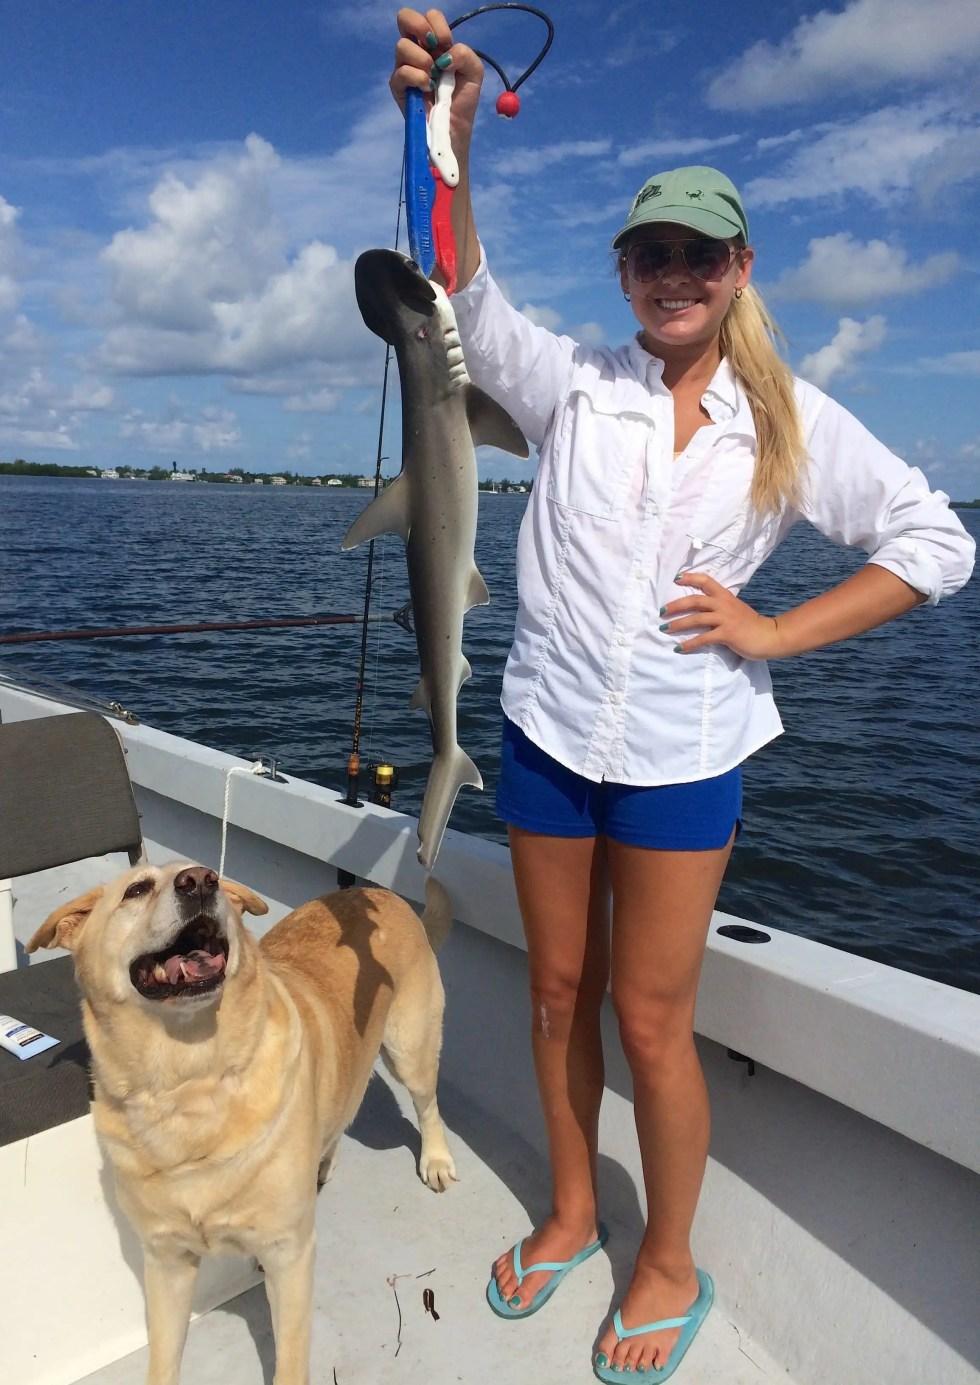 Bonnethead Shark, Sanibel Fishing & Captiva Fishing, Wednesday, 8-19-15 ~ #Sanibel #Captiva.